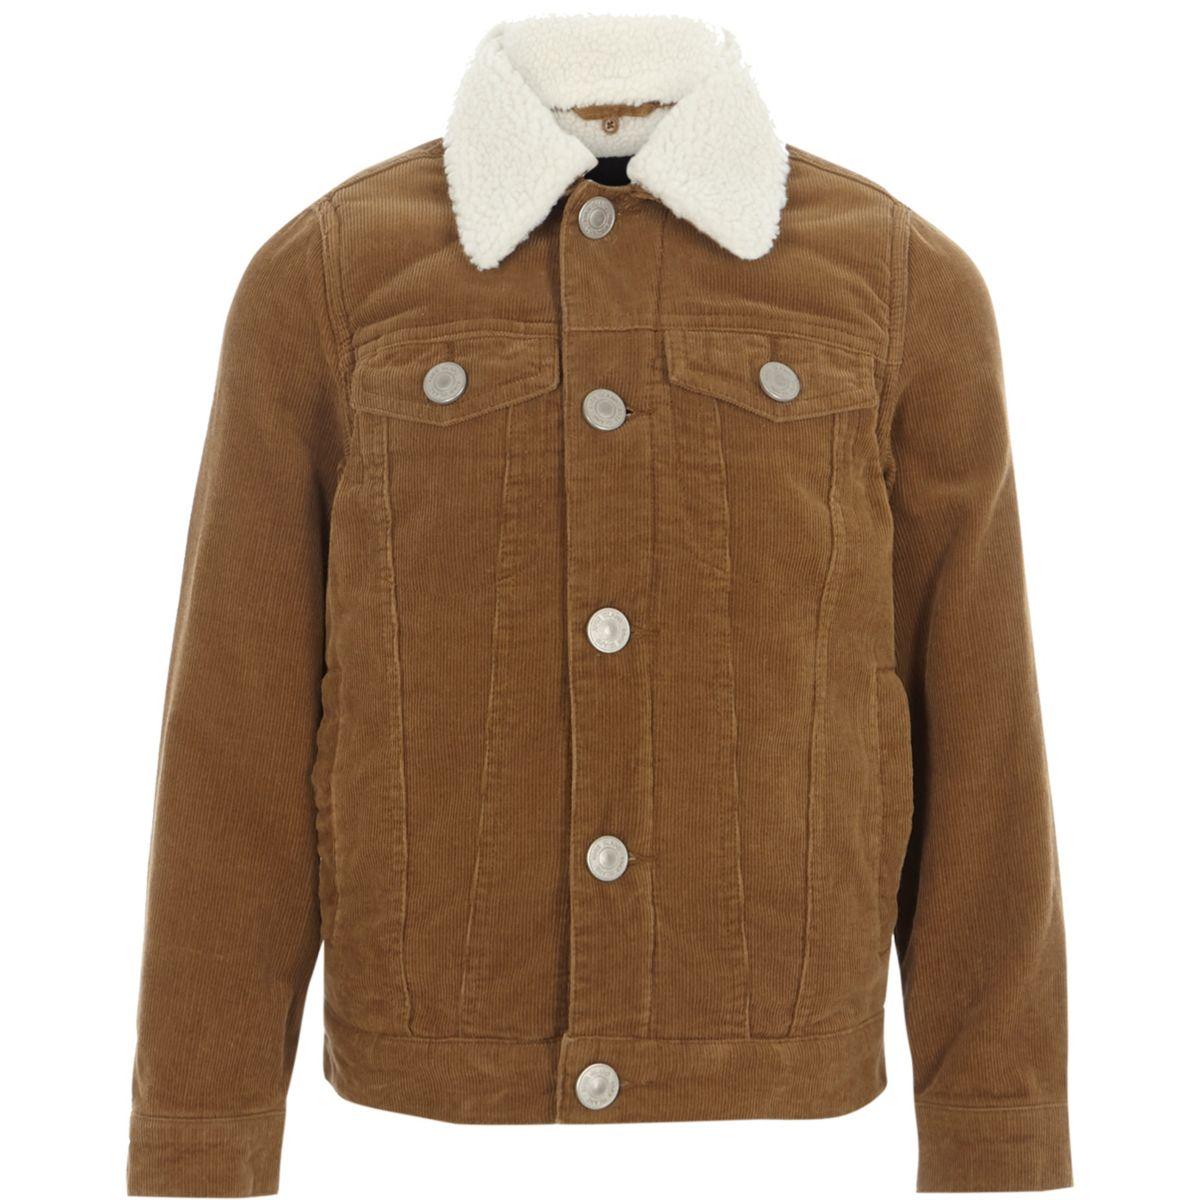 Boys tan borg lined corduroy trucker jacket